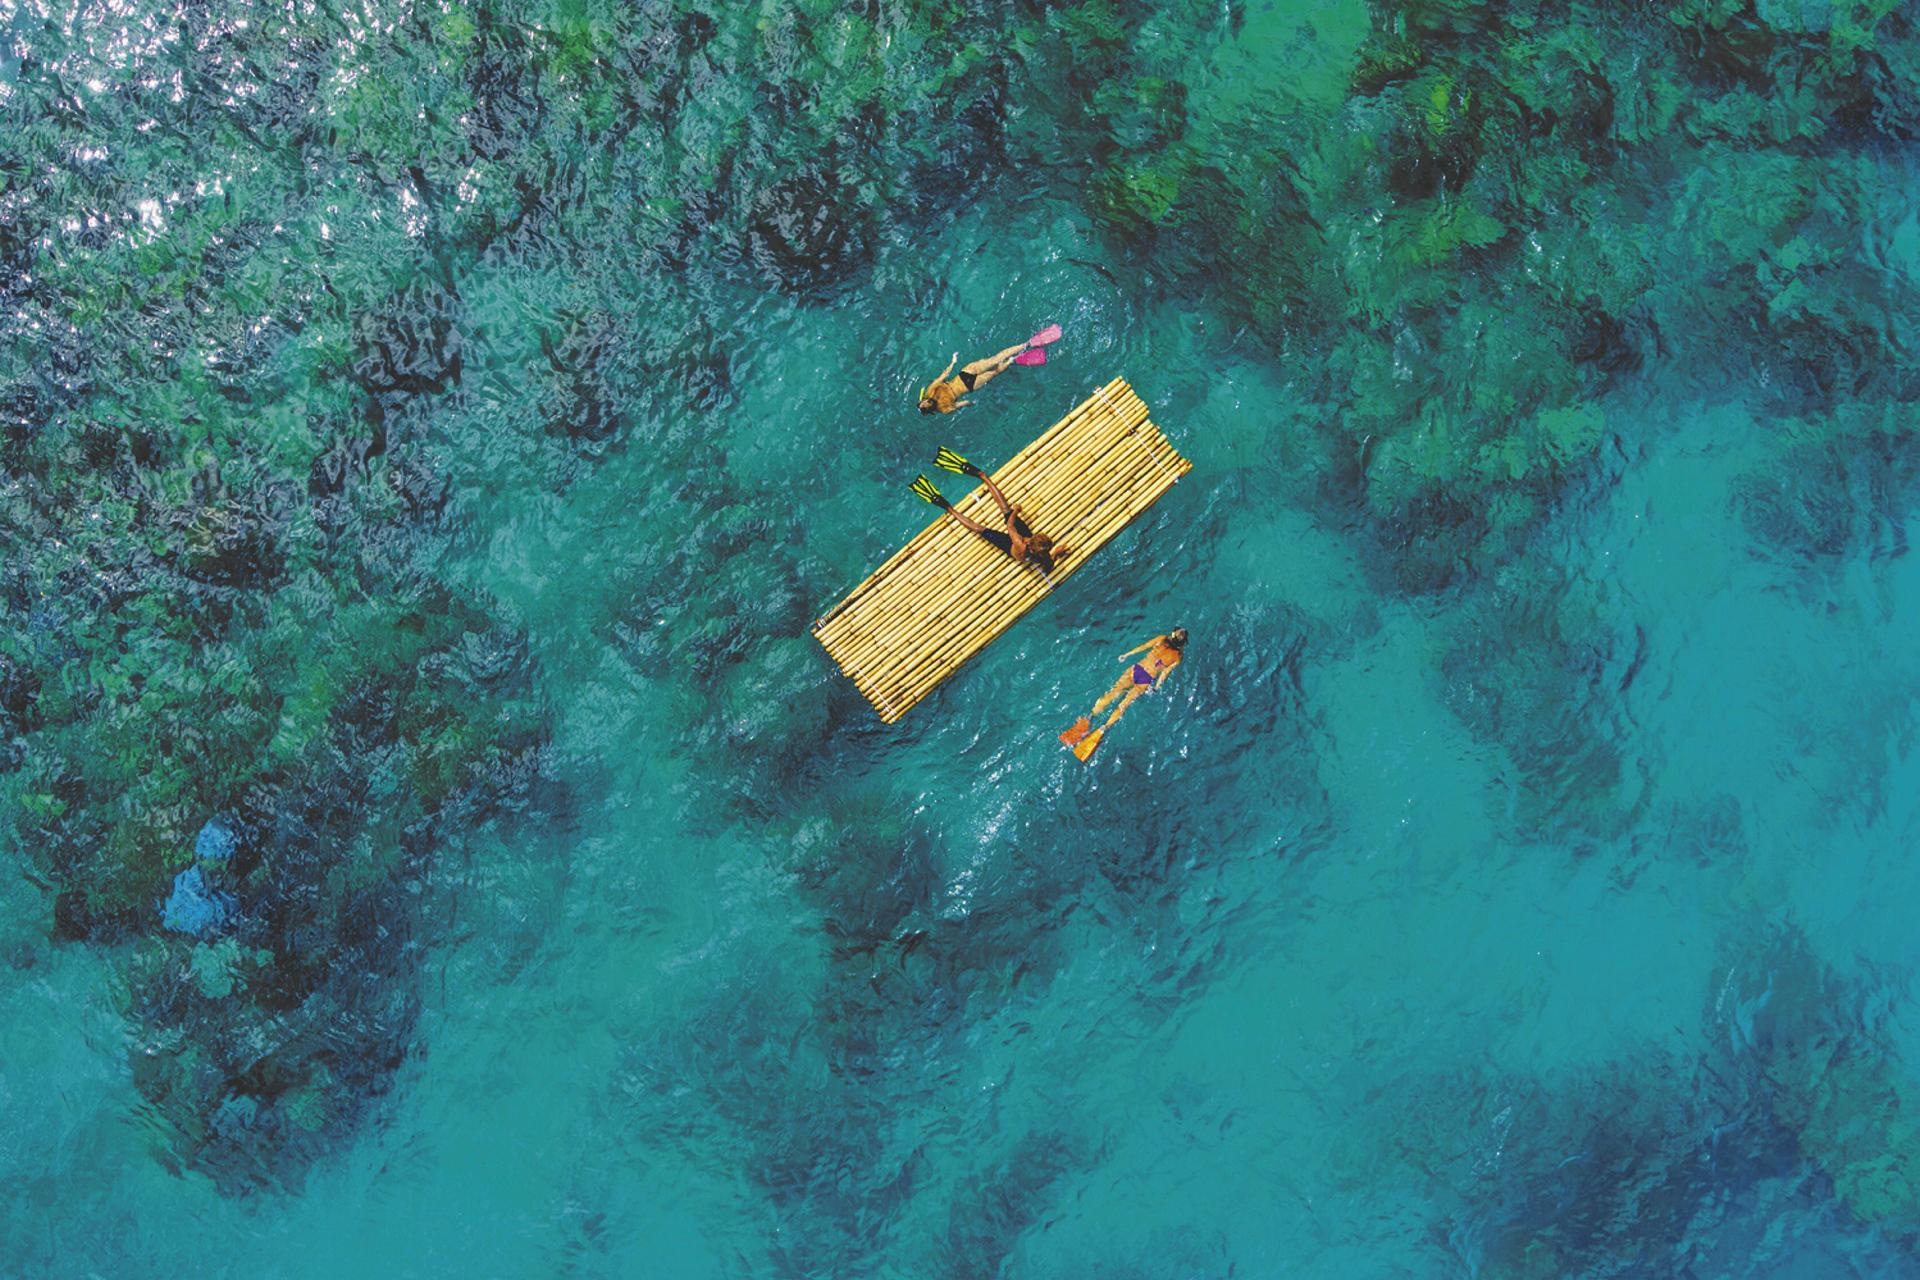 Schnorcheln am Riff © Chris McLennan